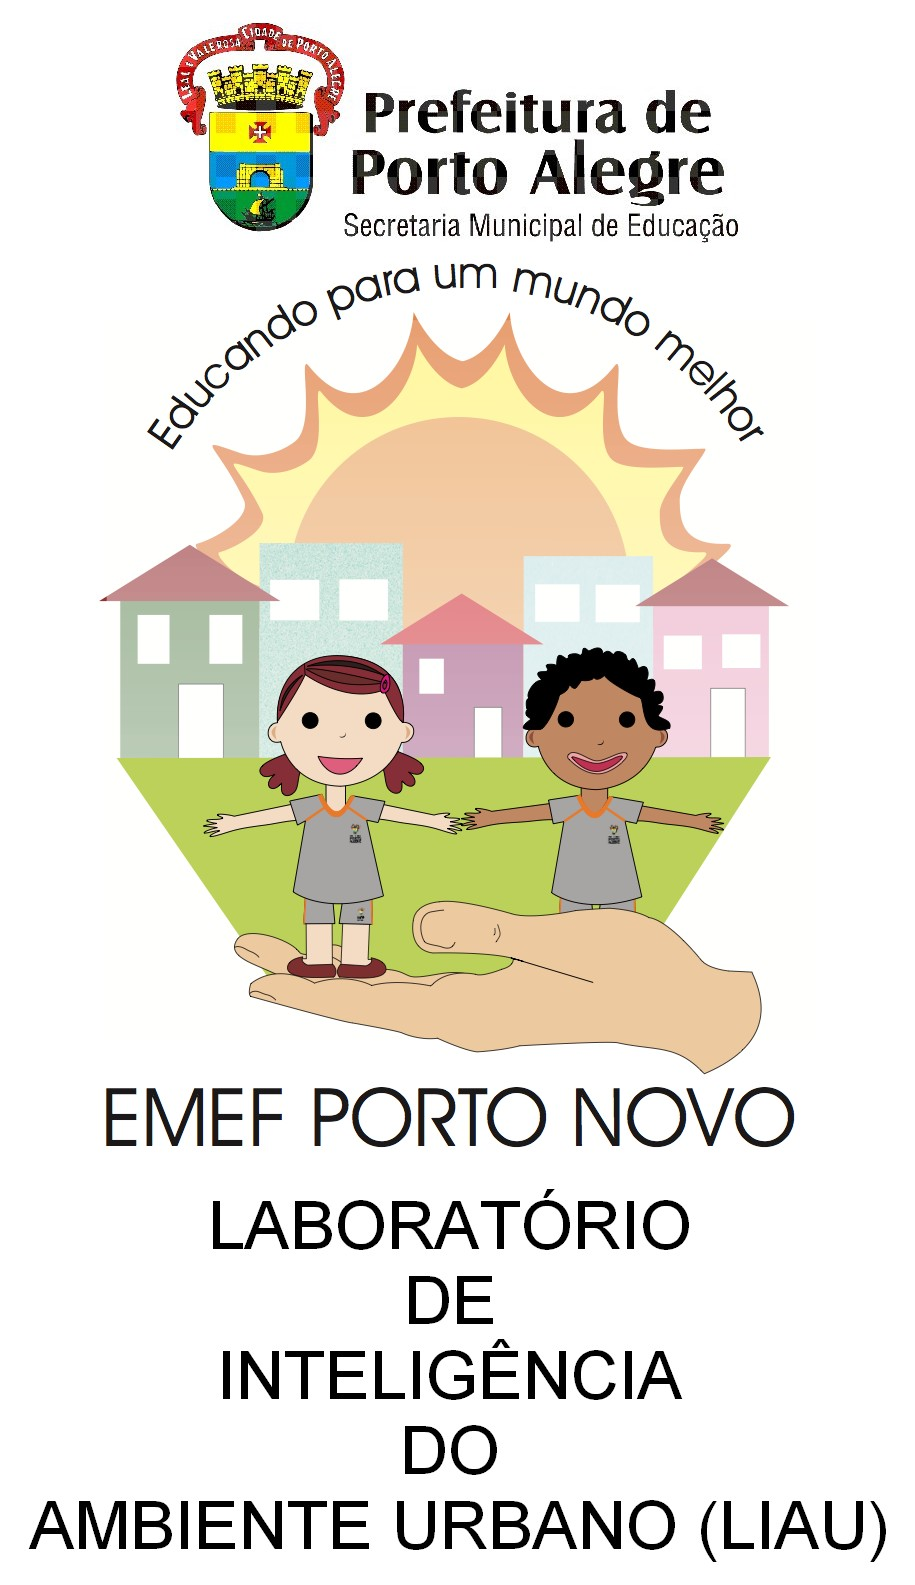 :::LIAU da E.M.E.F. Porto Novo:::